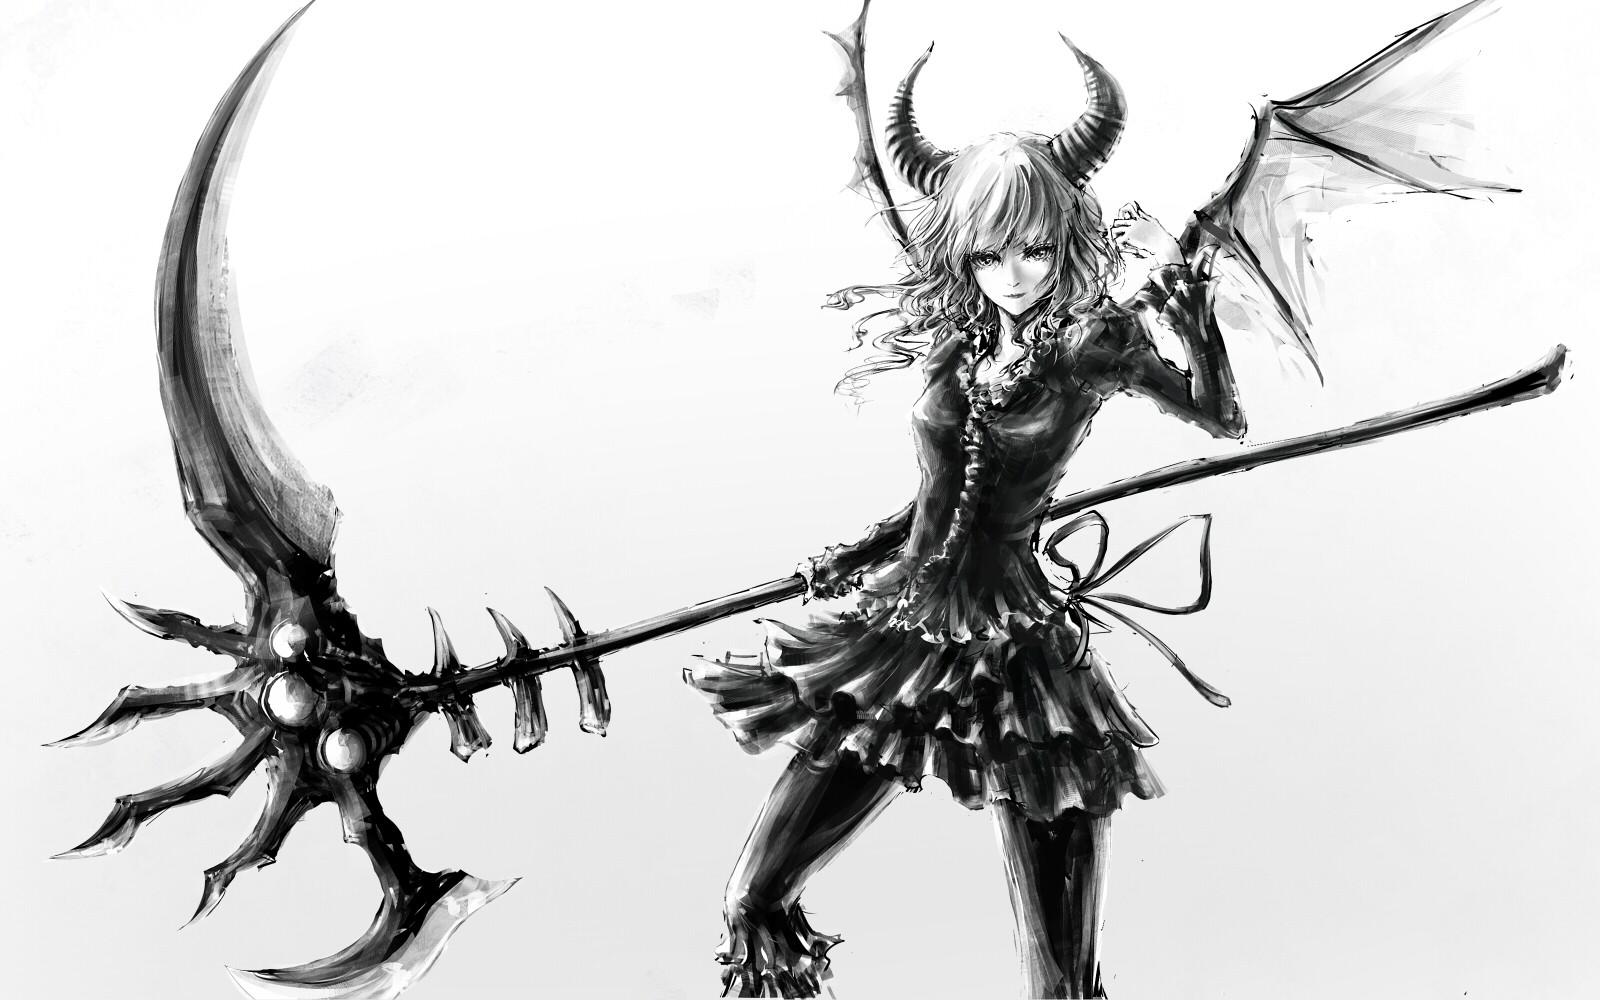 Drawn scythe spine Legends of already? has we